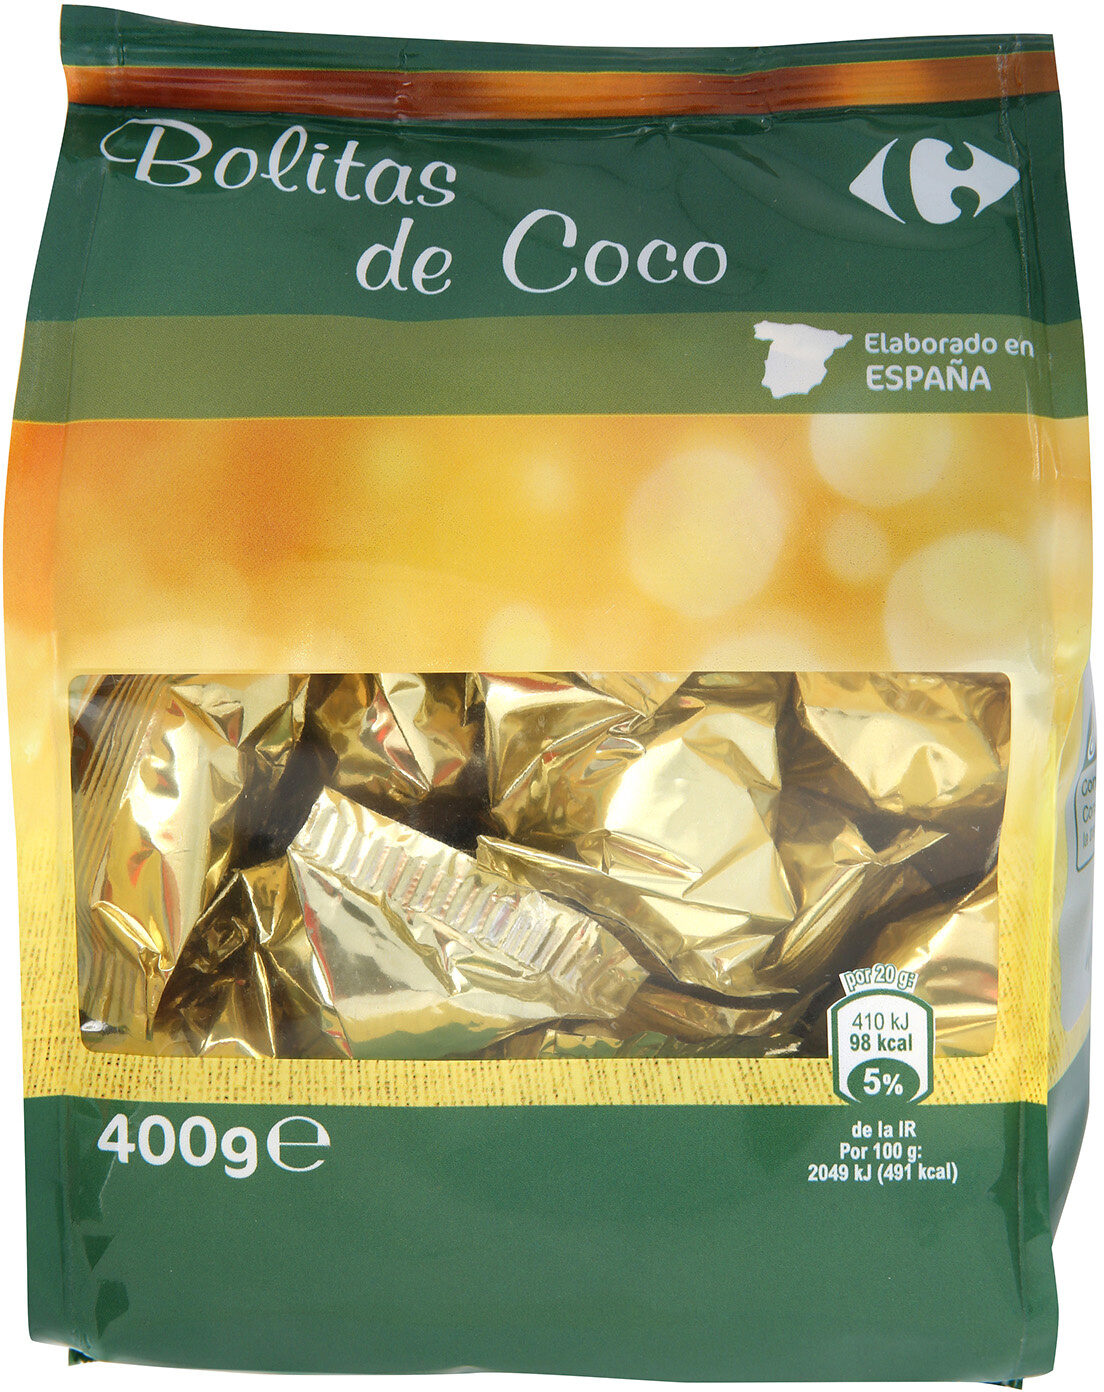 Bolitas coco - Producte - es